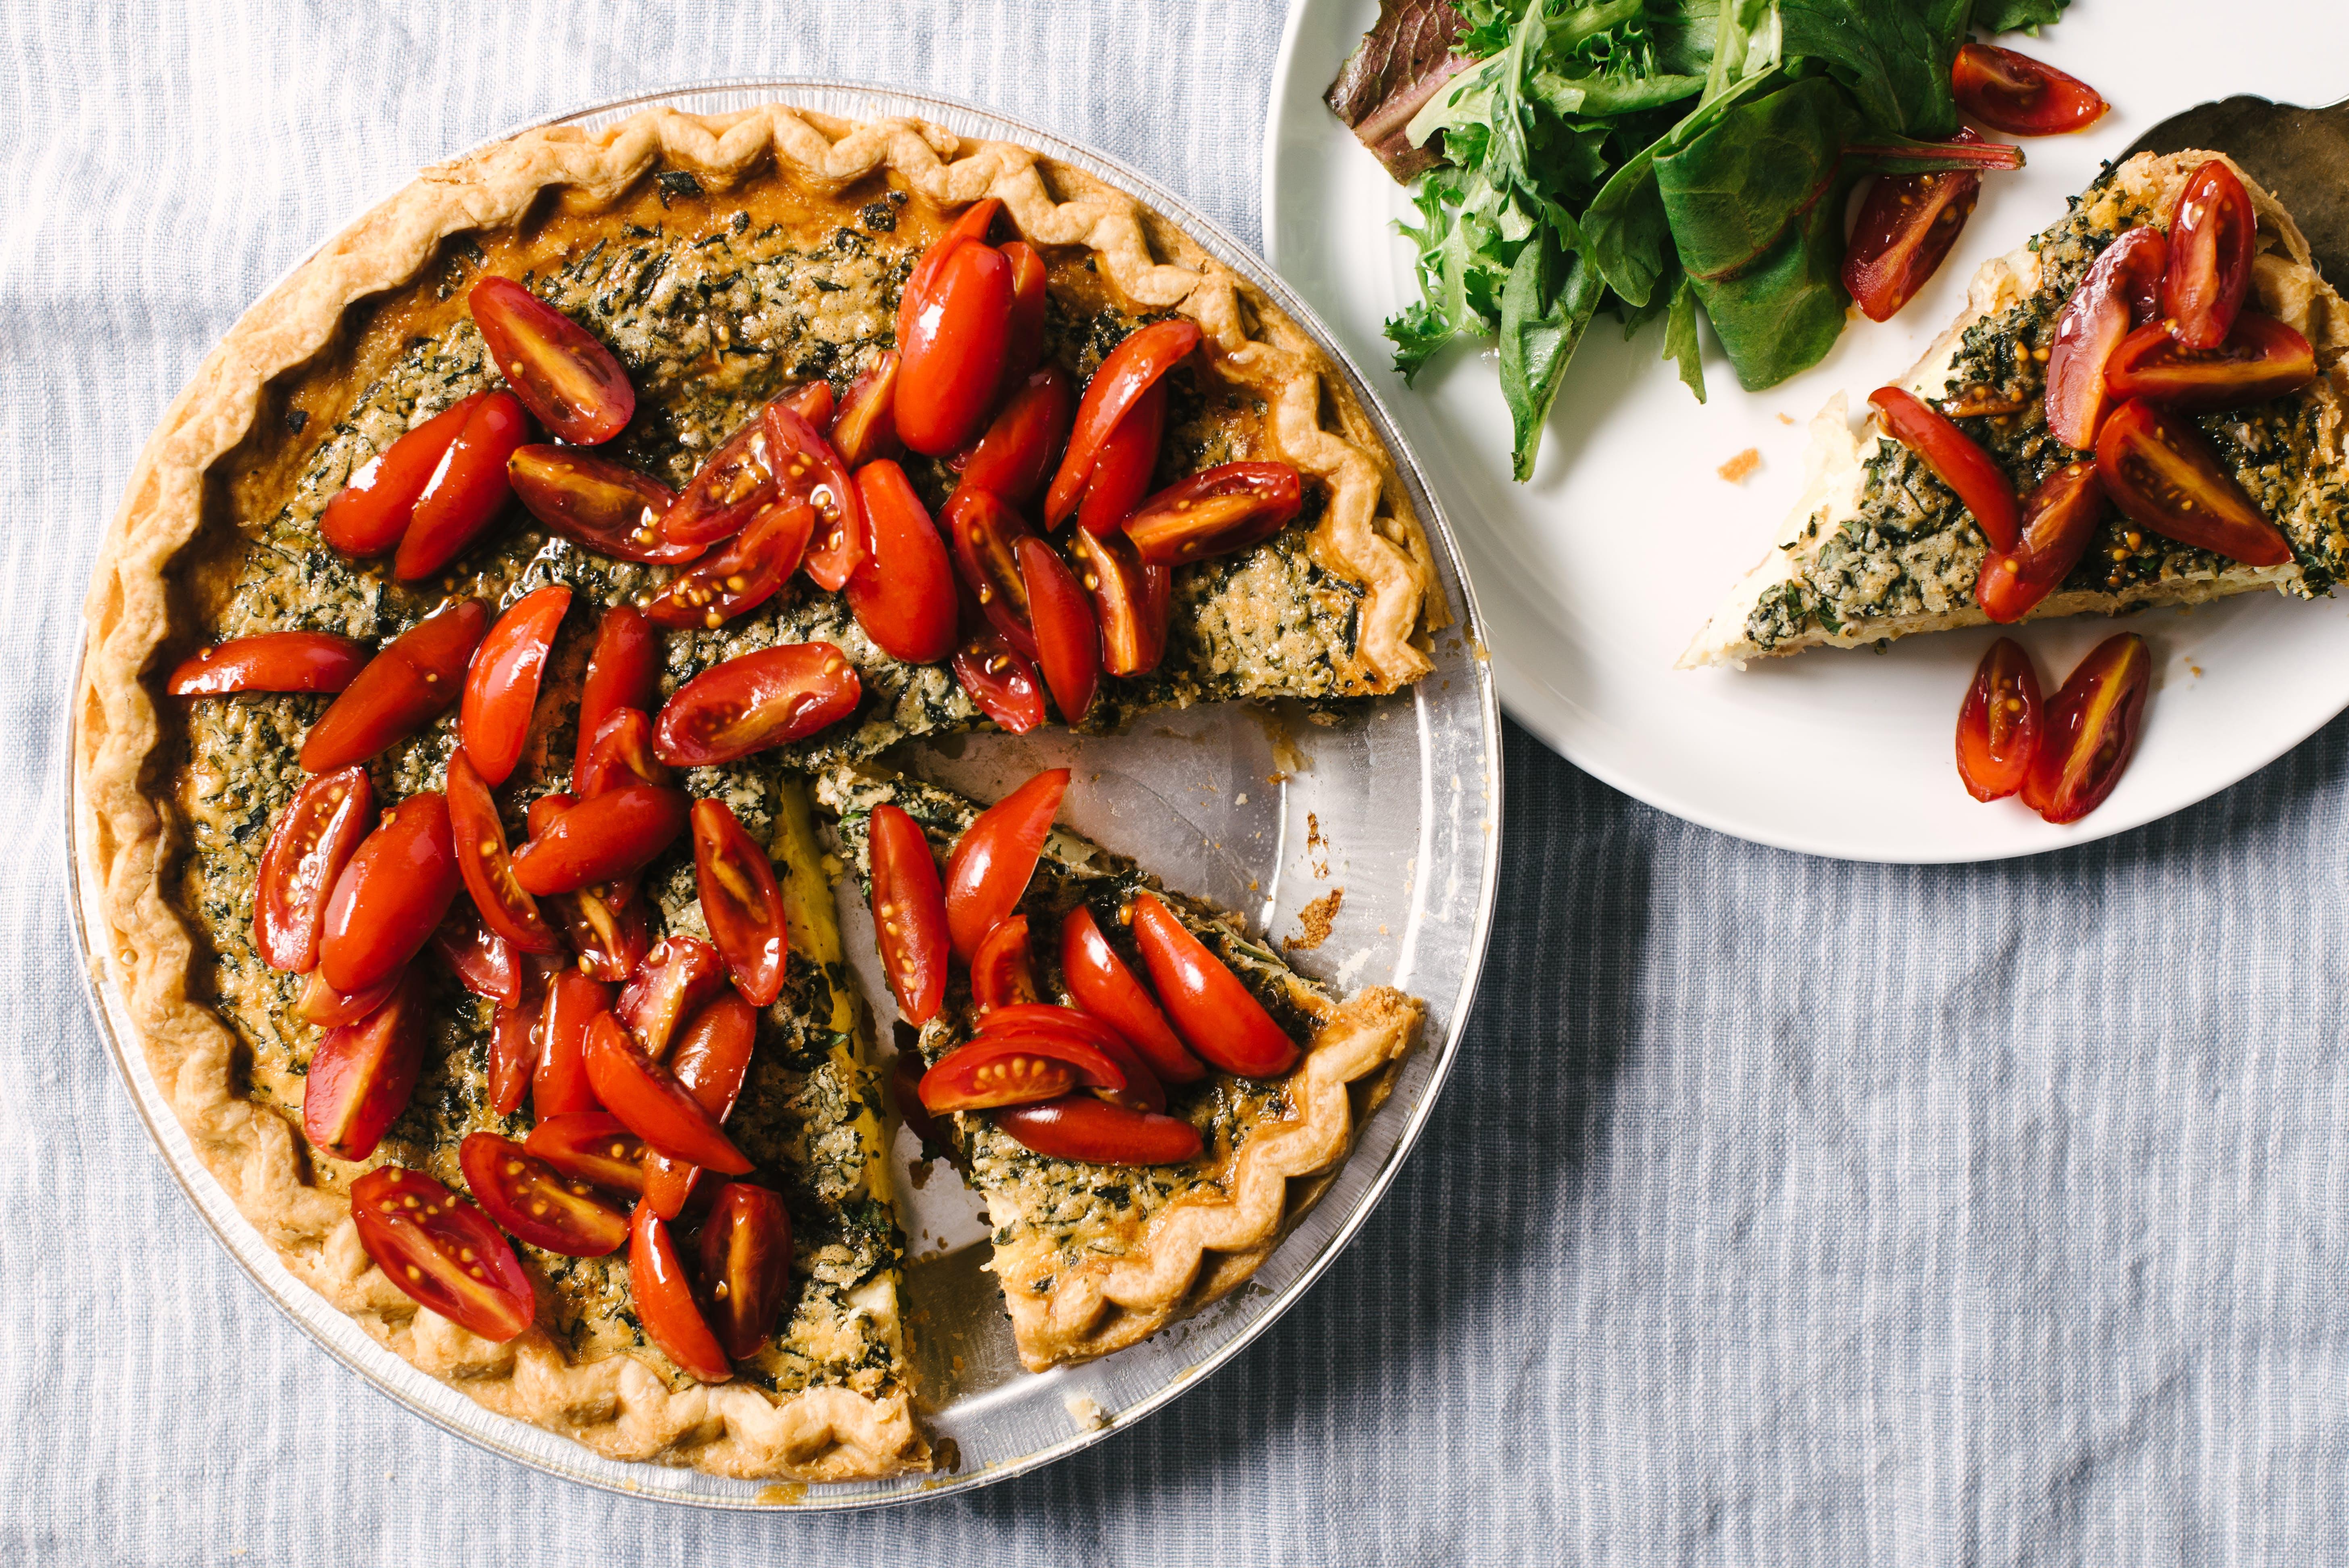 Ina Garten's Spanish Tapas Peppers